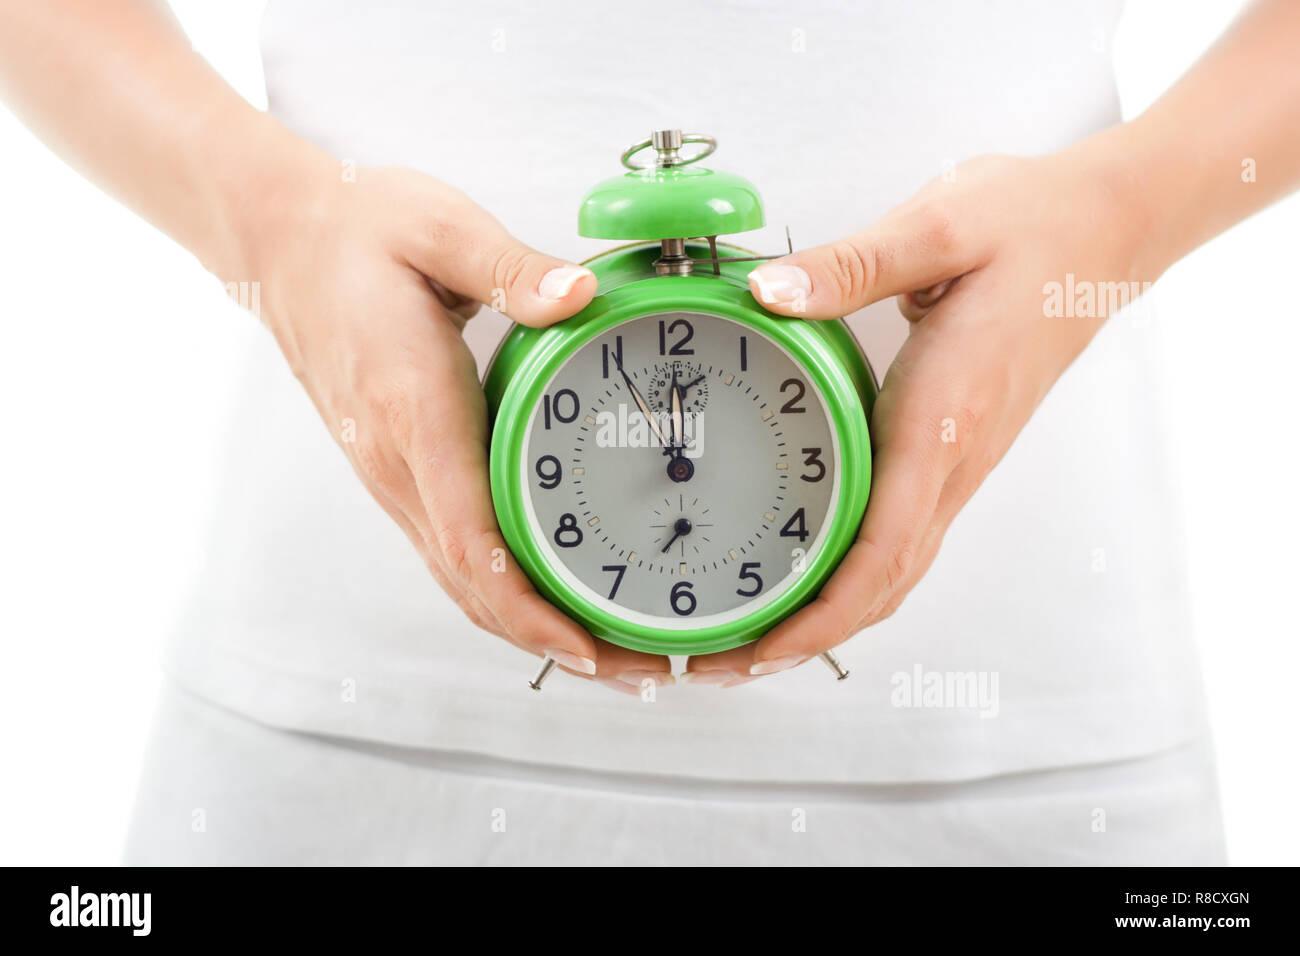 Biological clock - Stock Image